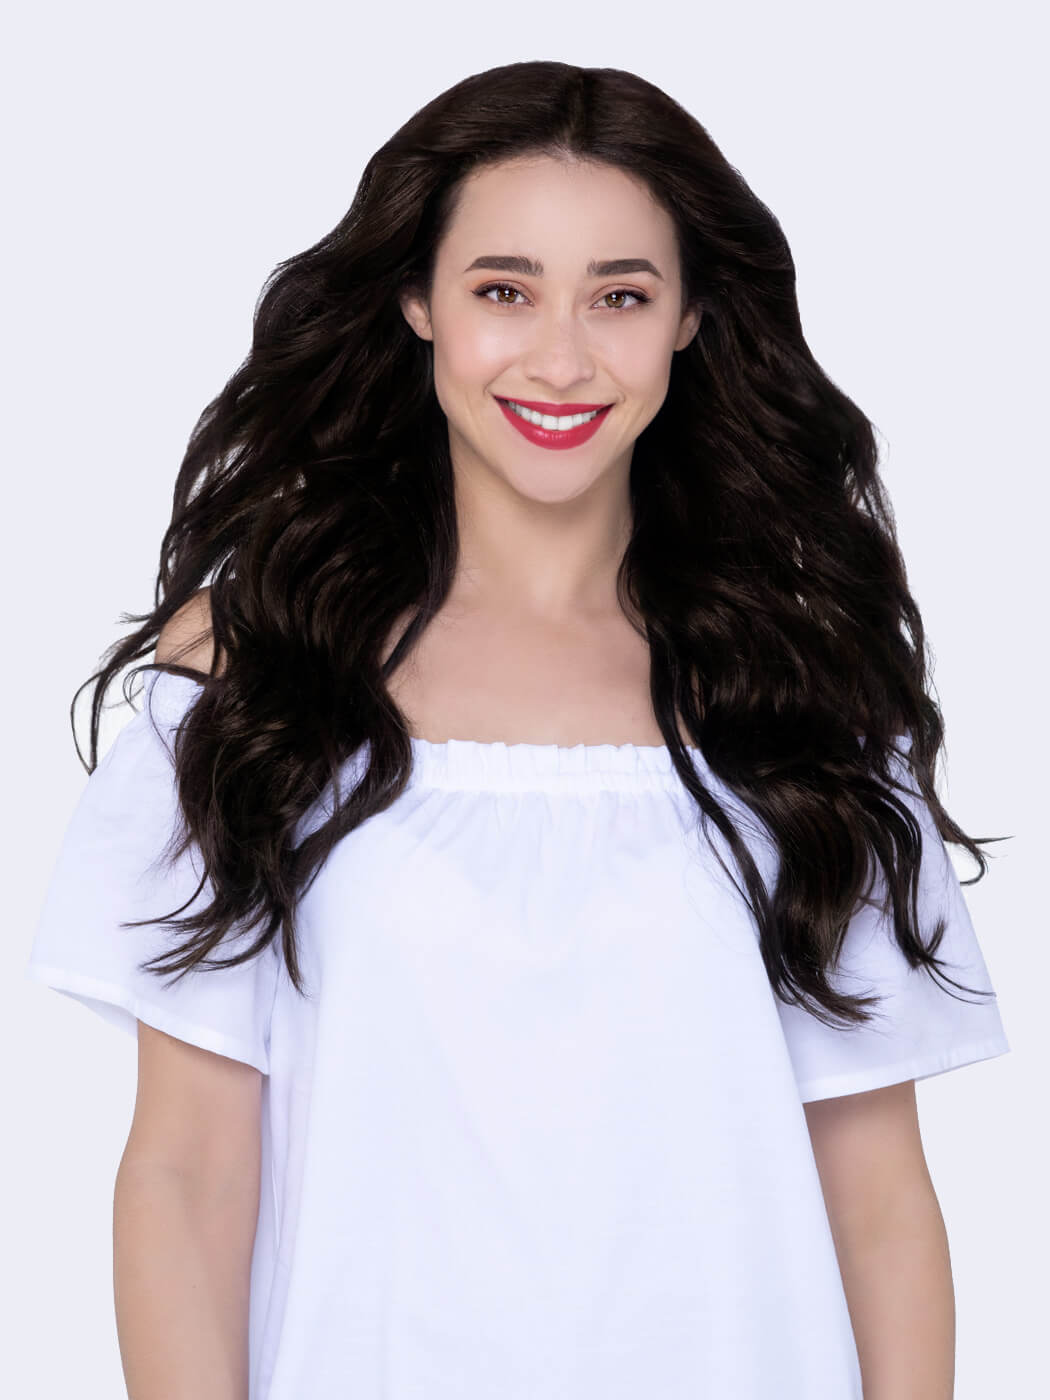 Natural Hair Clip Ins | Real Human Hair Extensions | 20 Inch Hair Extensions | Hair Extensions For Thin Hair | Remy Hair